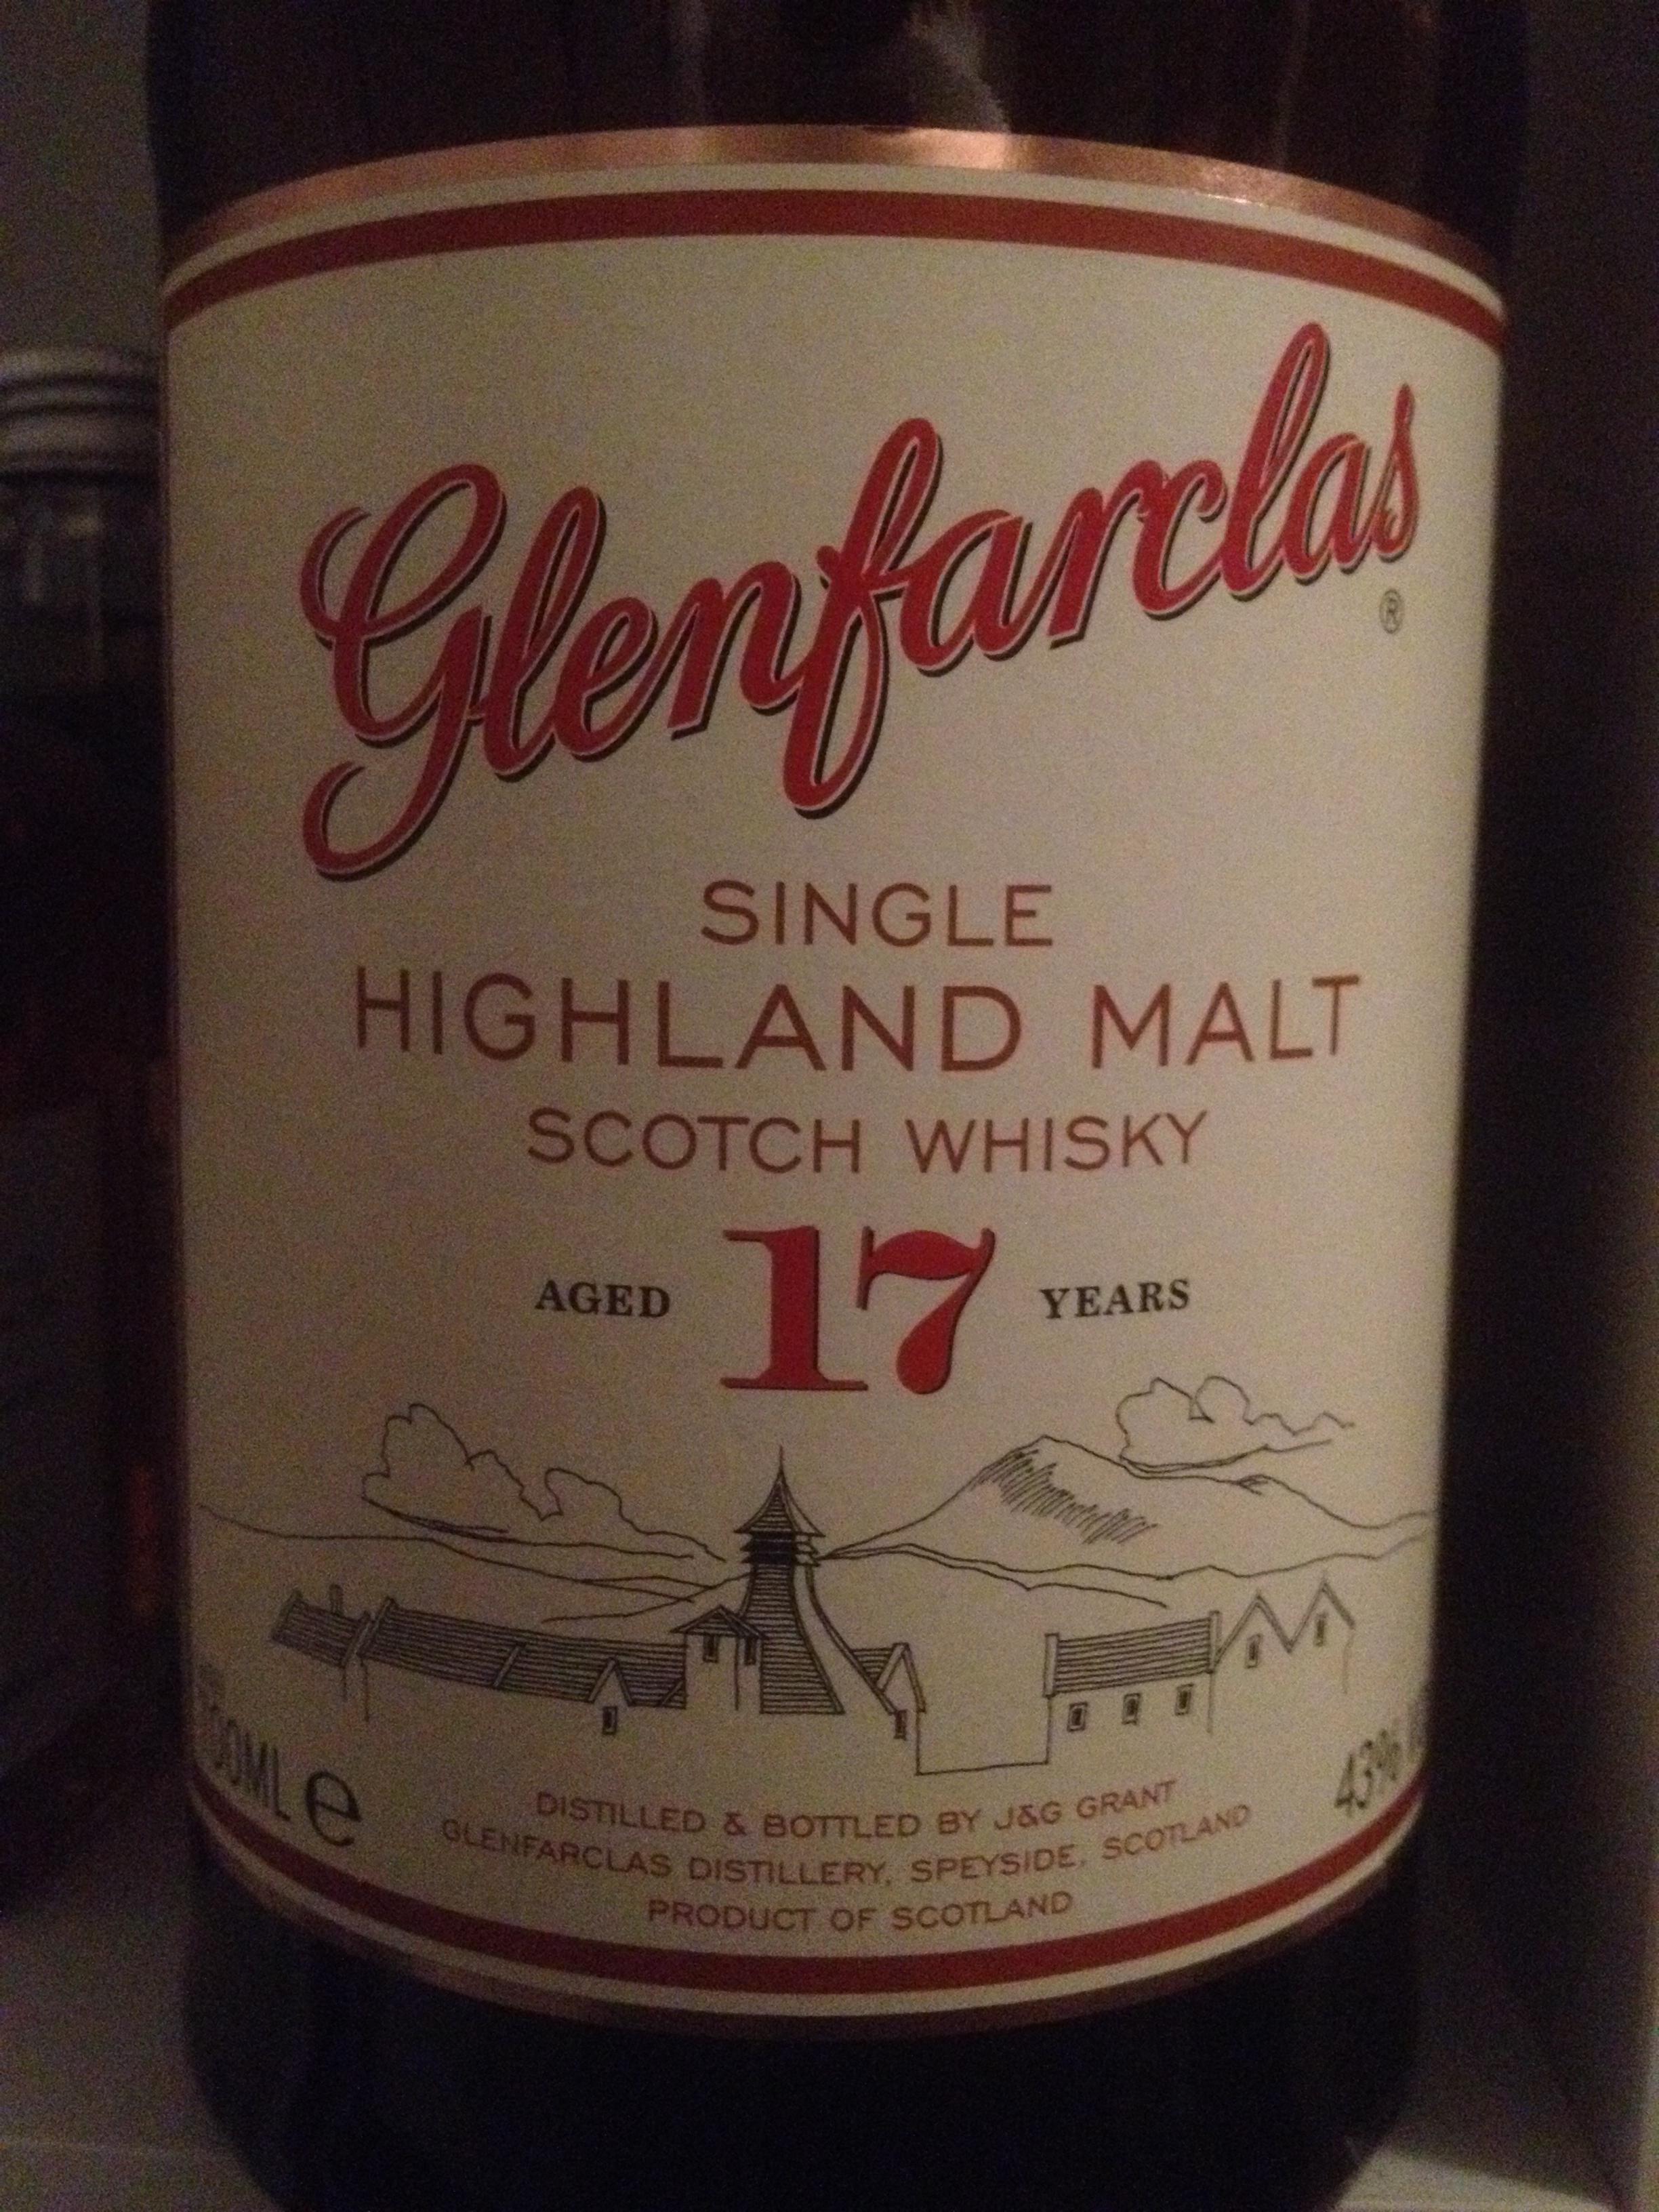 Glenfarclas 17y OB - Whiskysample.nl: http://www.whiskysample.nl/nl/product/glenfarclas-17y-ob/